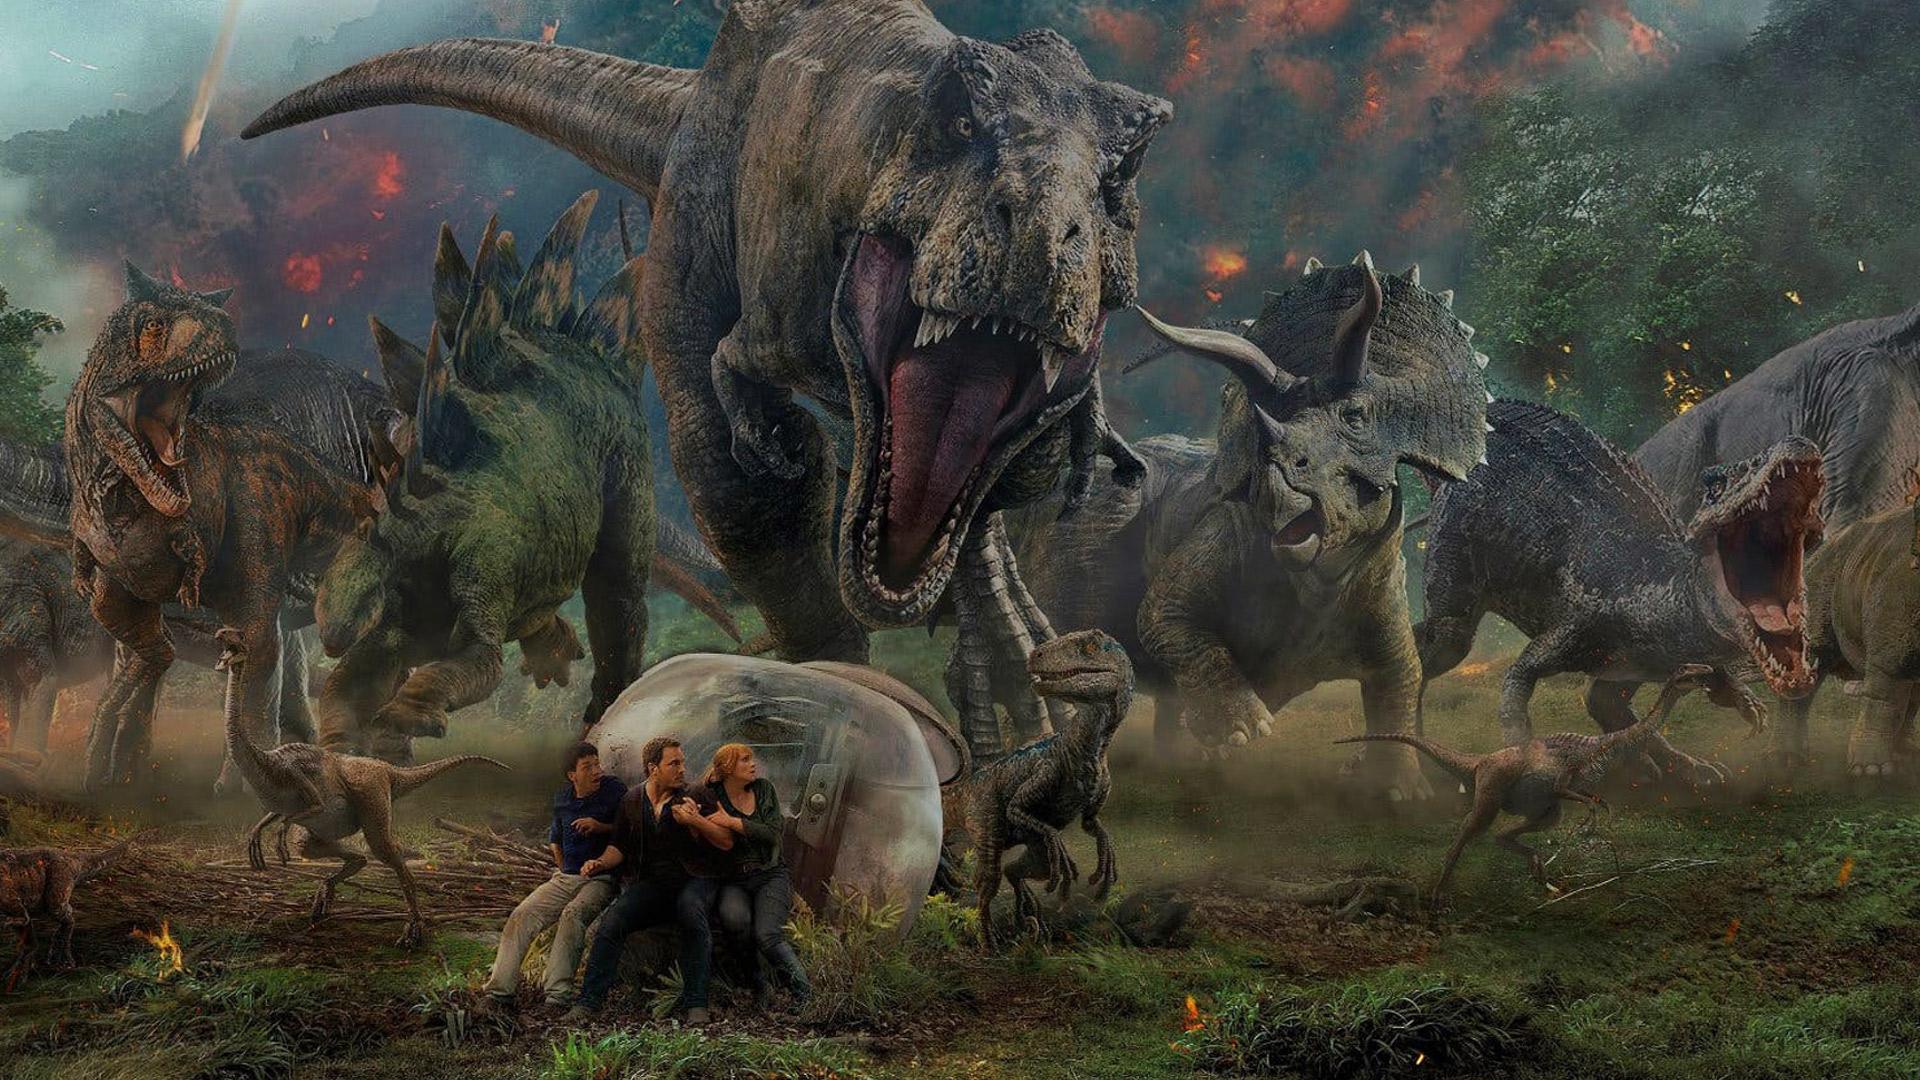 Jurassic World Fallen Kingdom 2018 Film Blitz